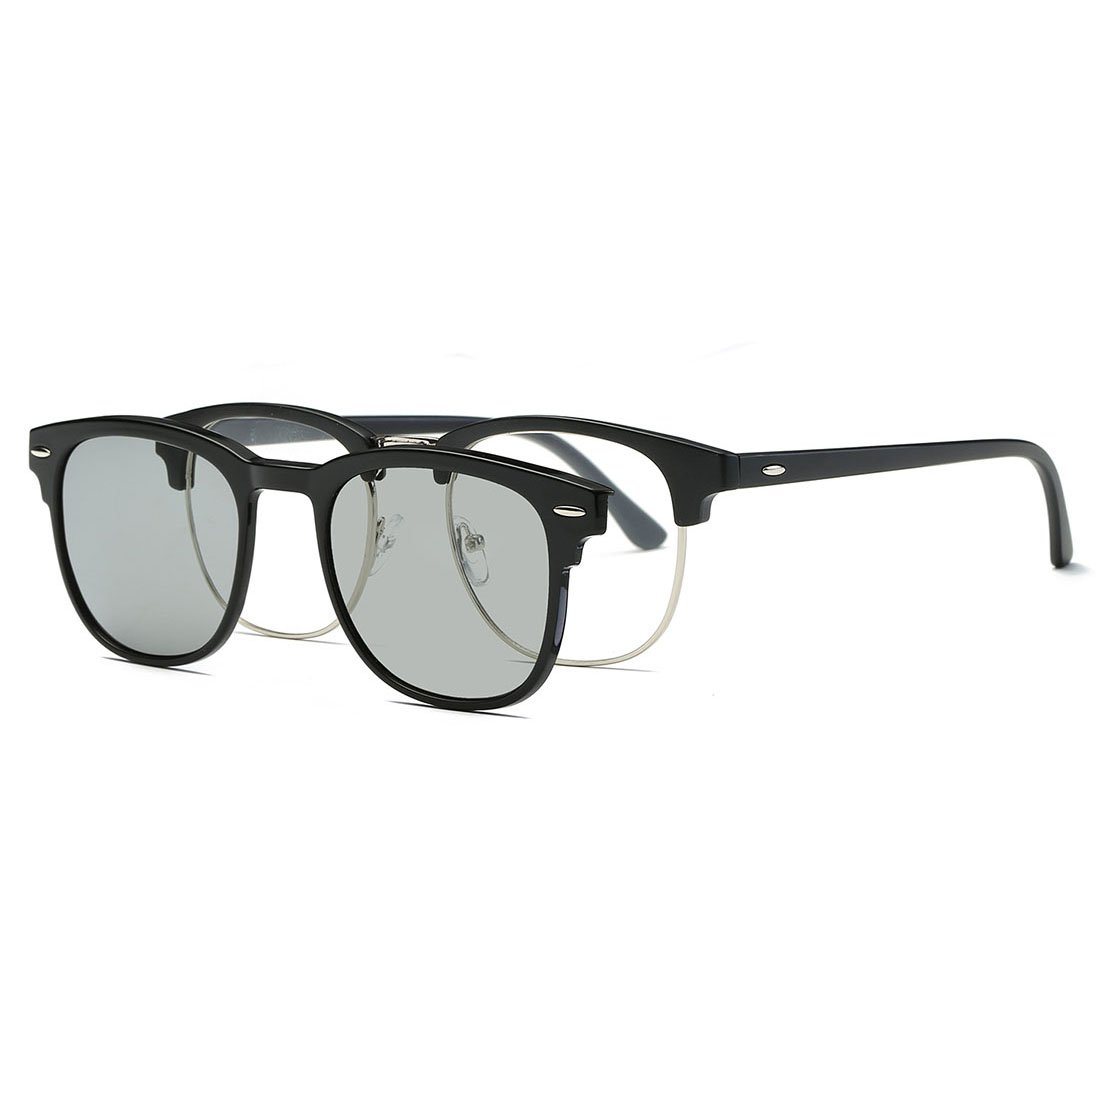 99268cf2bad Galleon - AEVOGUE Magnetic Clip-on Polarized Sunglasses Mens Plastic  Titanium (TR90) Frame Unisex Prescription Glasses AE0510 (Black Sliver